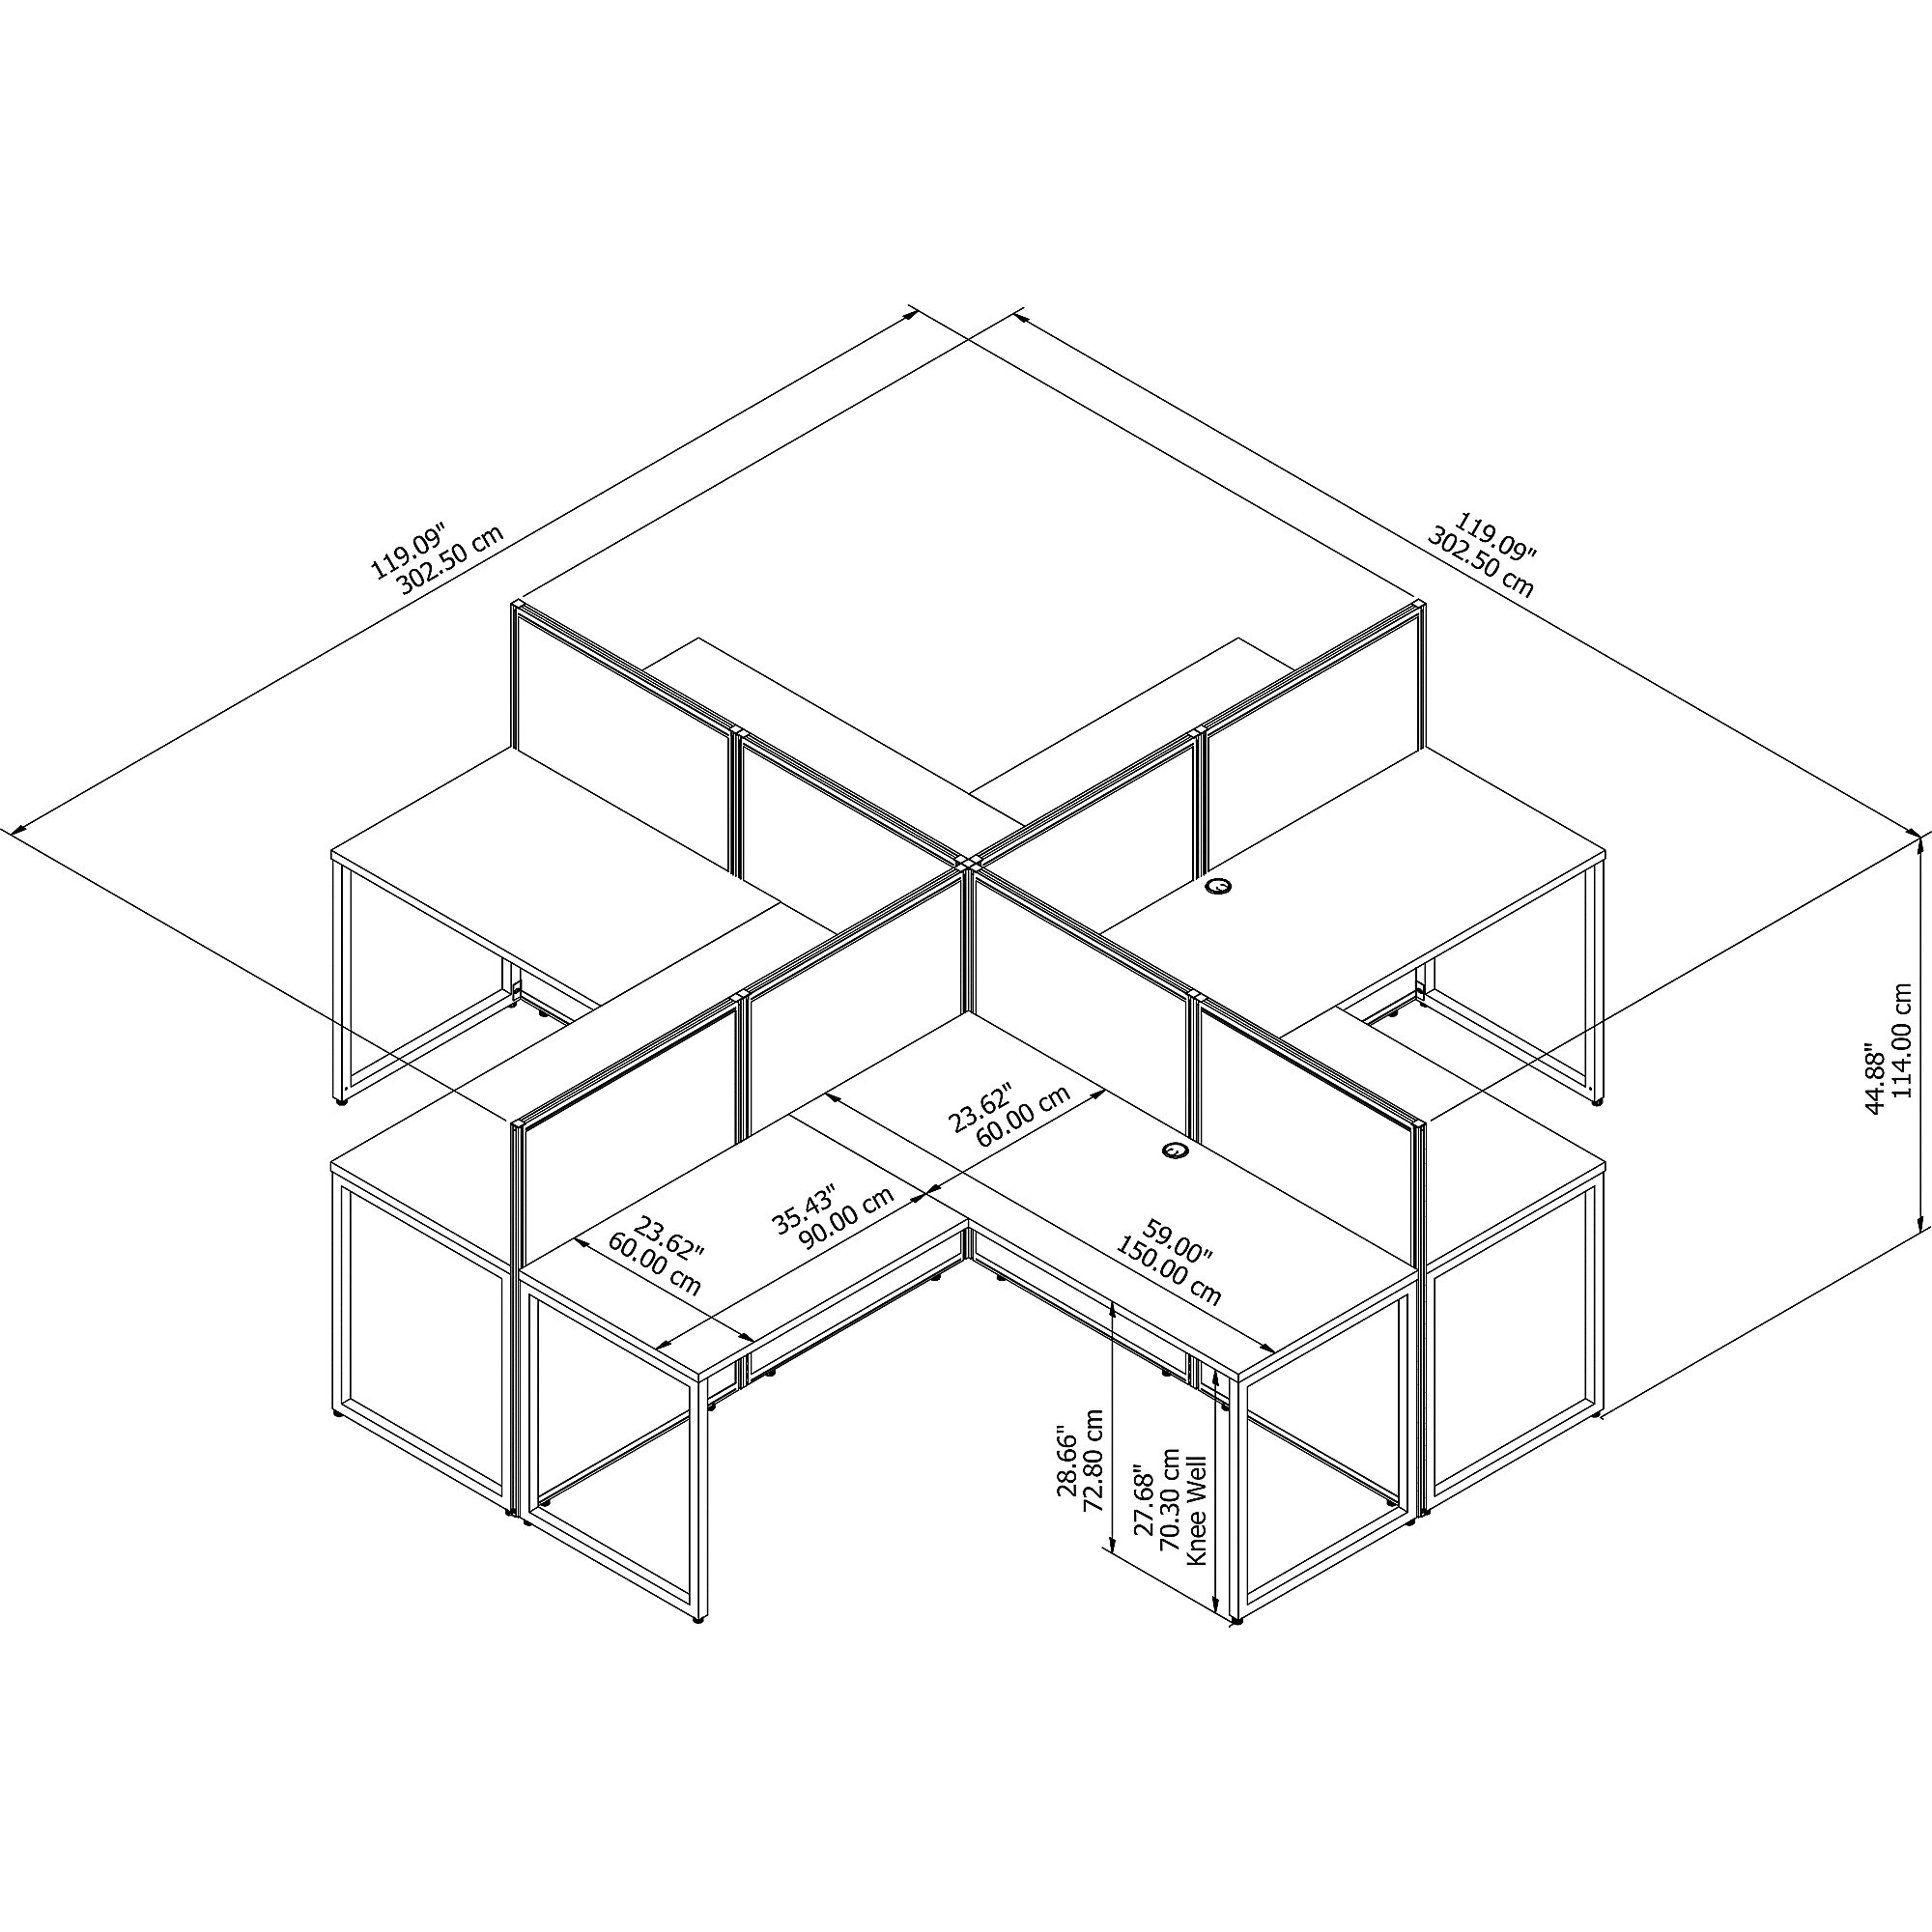 4 person cubicle configuration dimensions